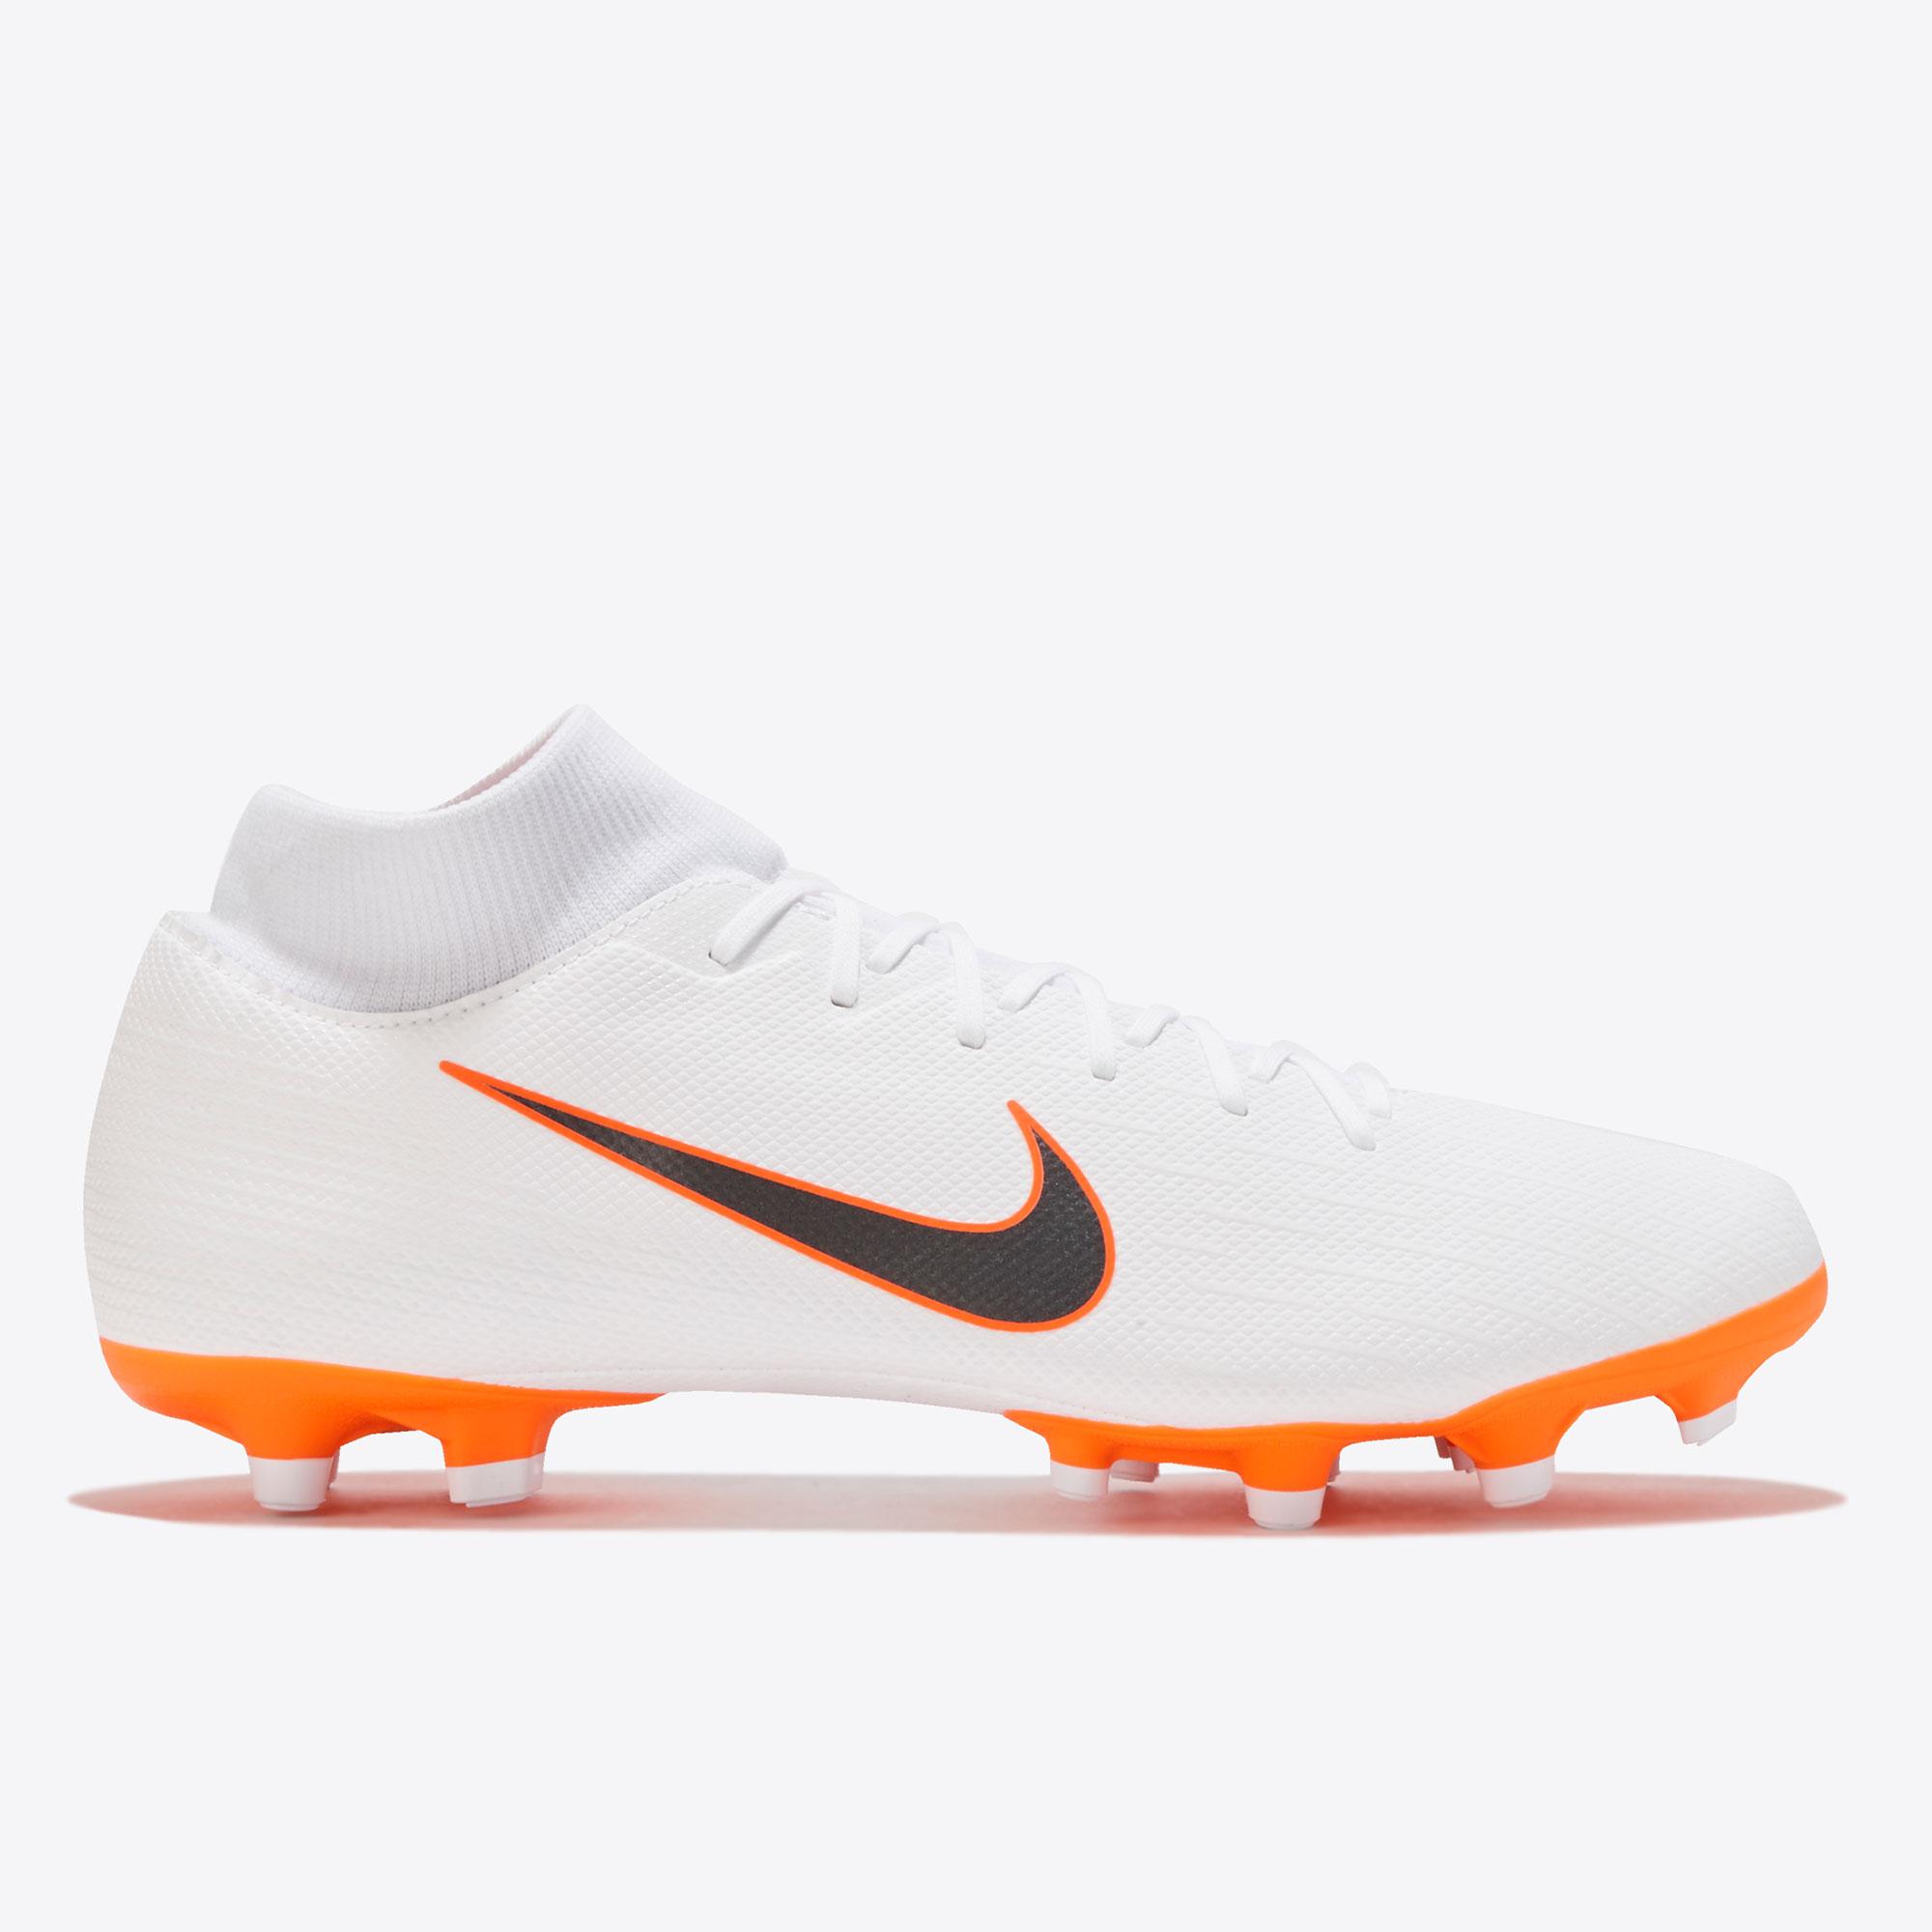 Chaussures de football Nike Mercurial Superfly6 Academy multi-terrains